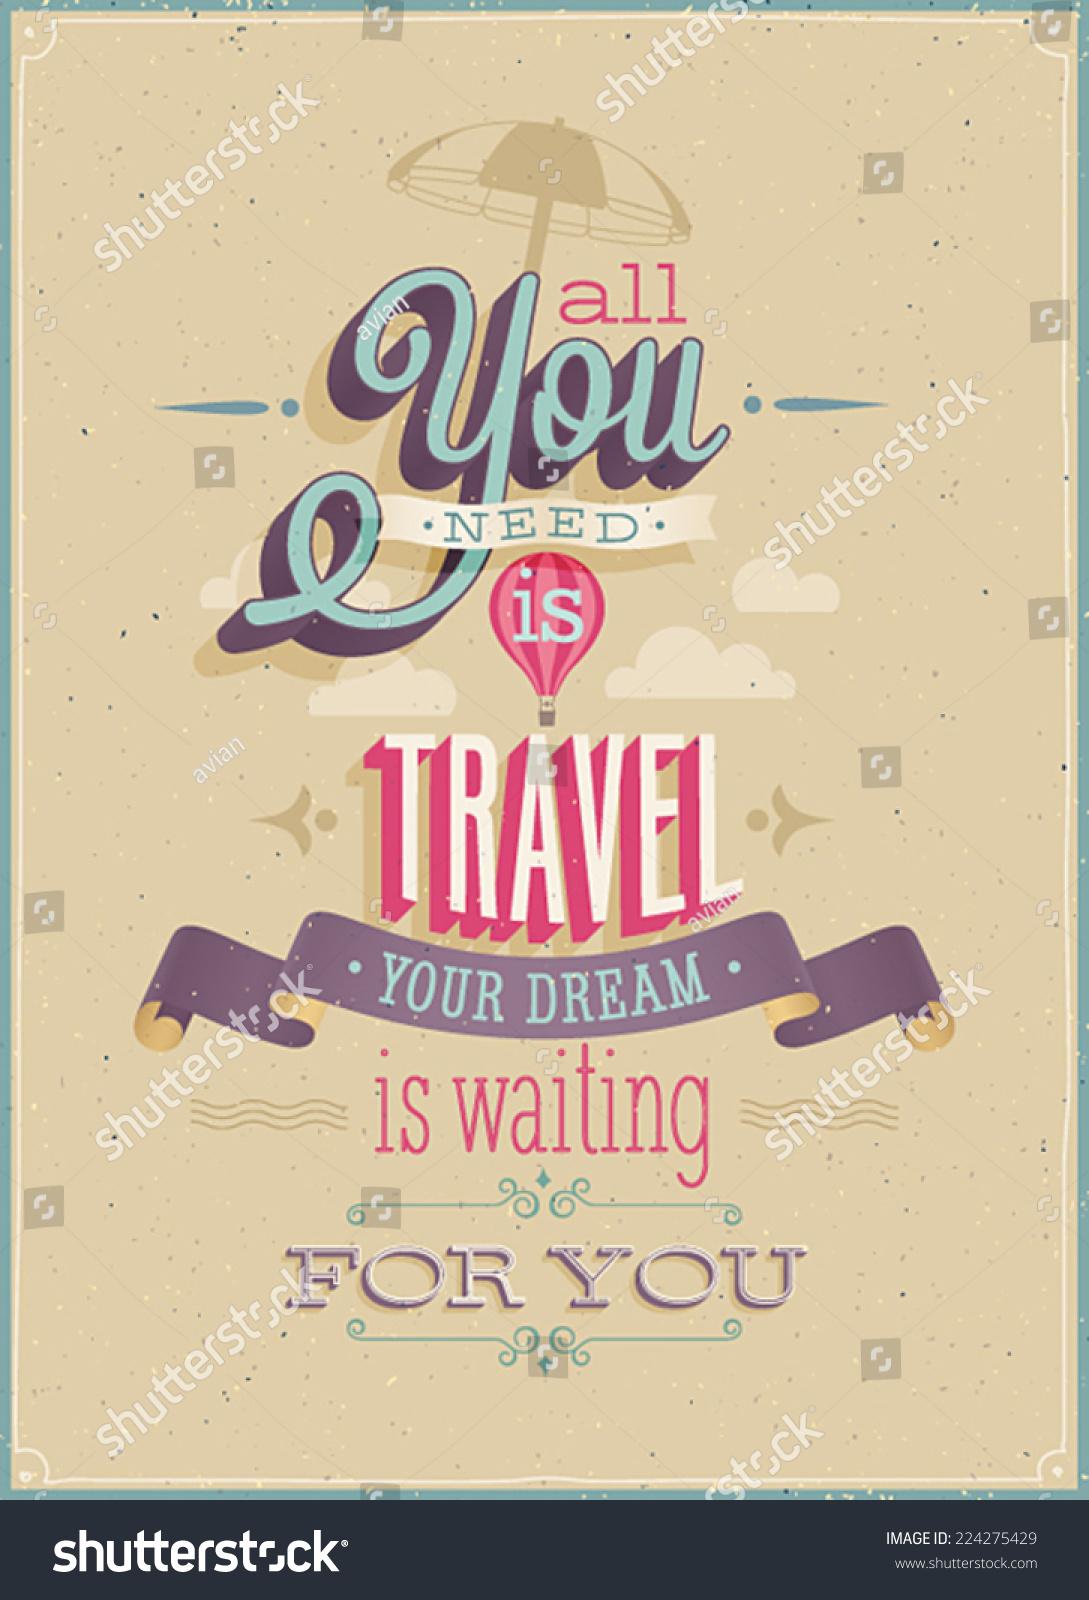 Vintage Travel Poster Vector Illustration Stock-Vektorgrafik ...